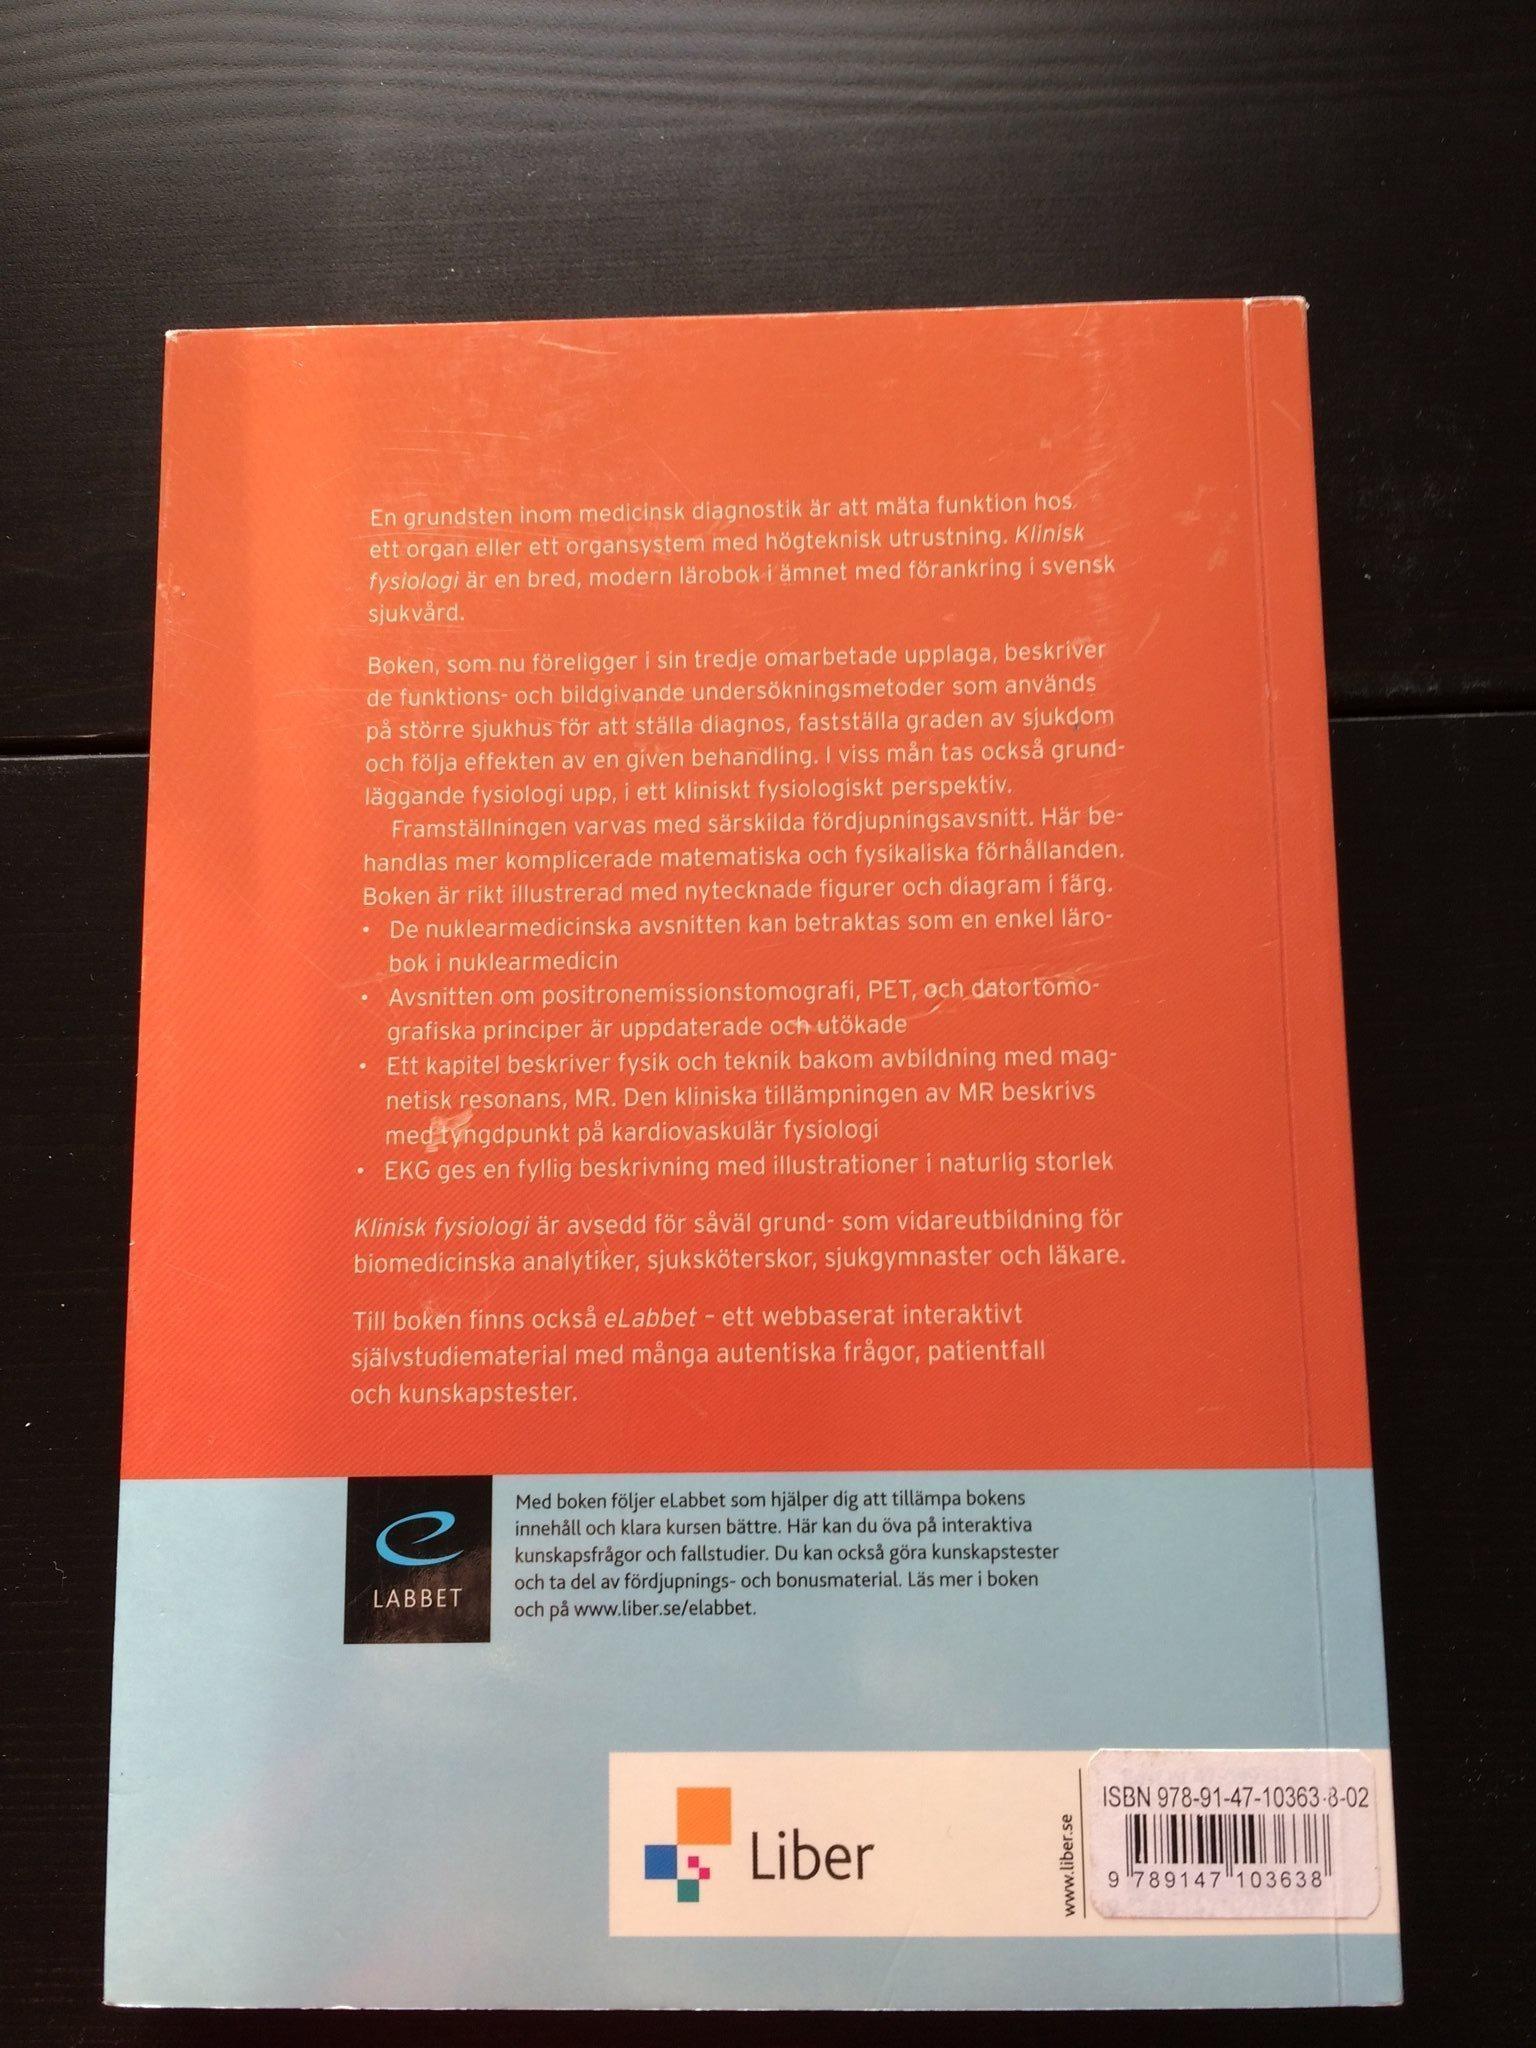 BMA utbildning kurslitteratur klinisk klinisk klinisk fysiologi 7d4b47